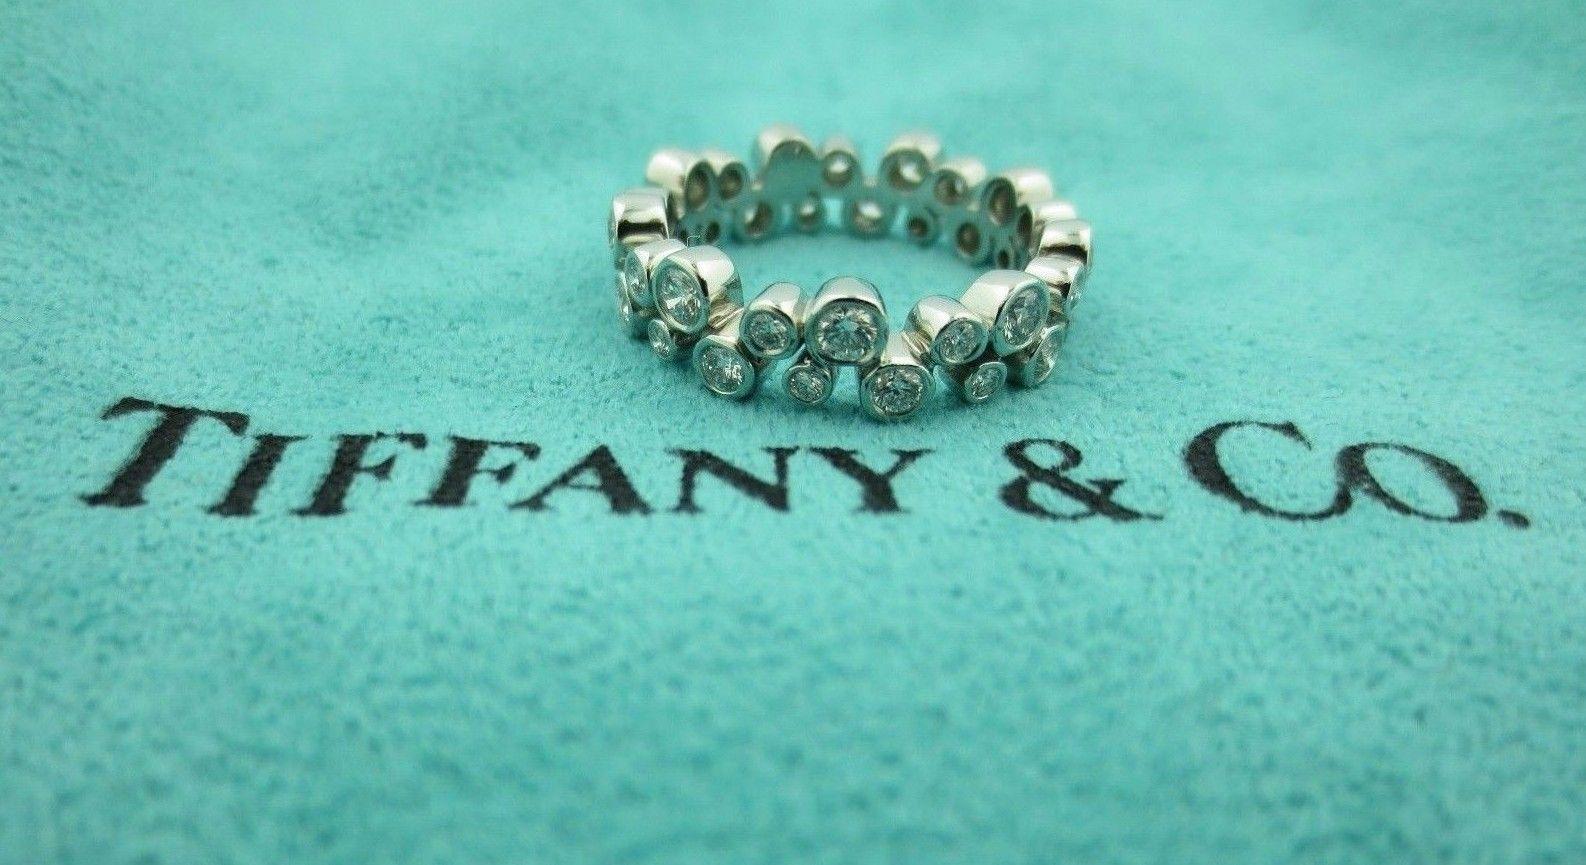 c907aabf7 S l1600. S l1600. Previous. TIFFANY & CO. BUBBLES PLATINUM WEDDING DIAMOND  BAND RING .96CT SIZE 6. TIFFANY & CO.